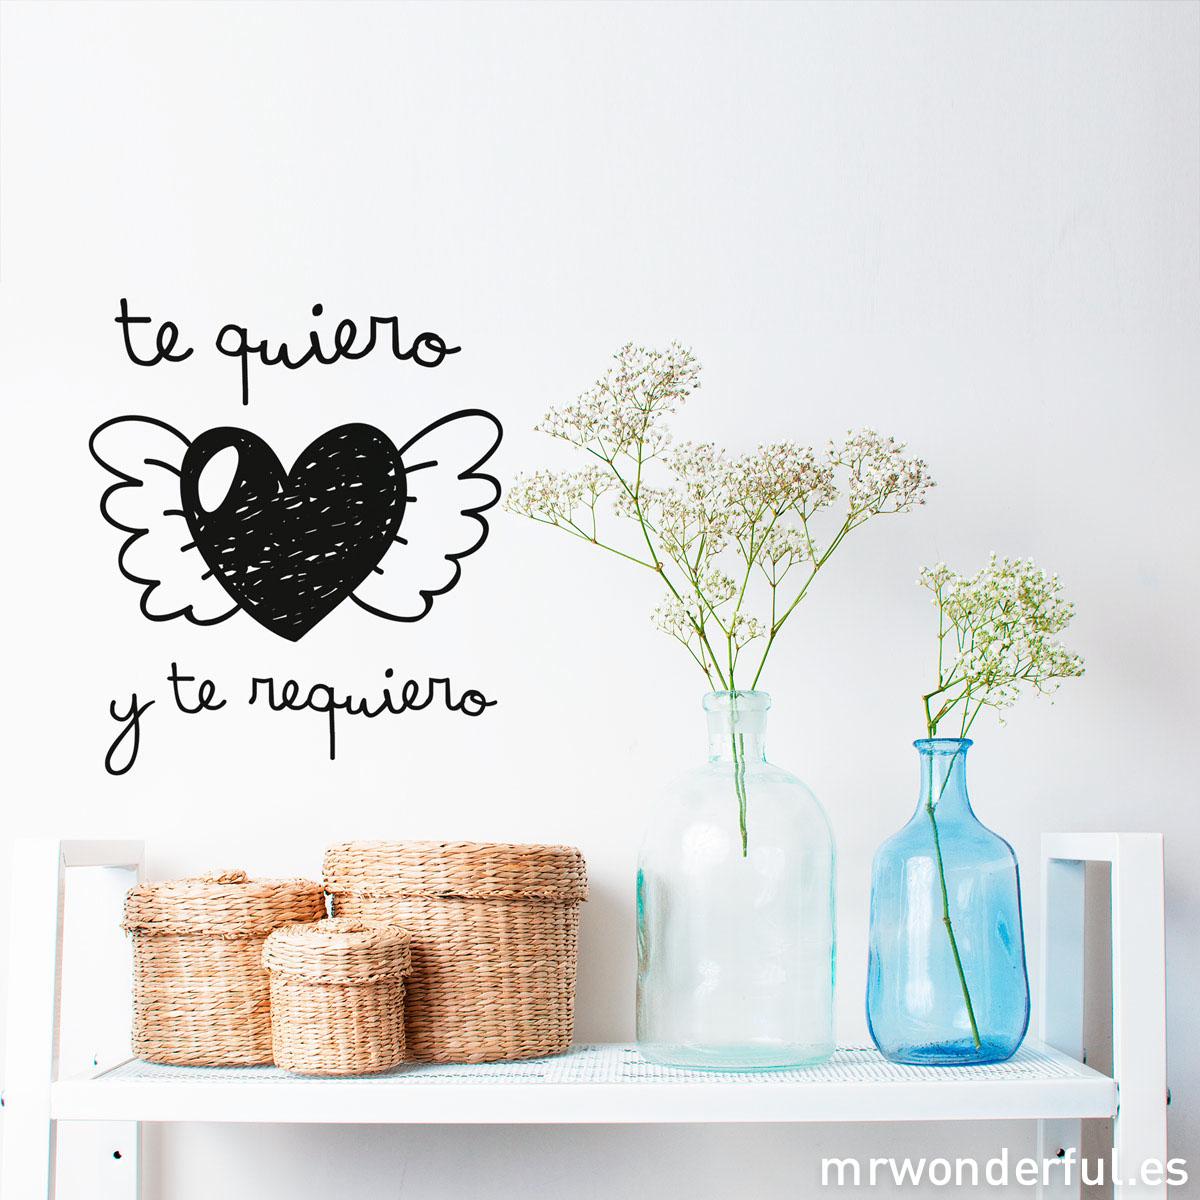 mrwonderful_vinilos_Te-quiero_1200